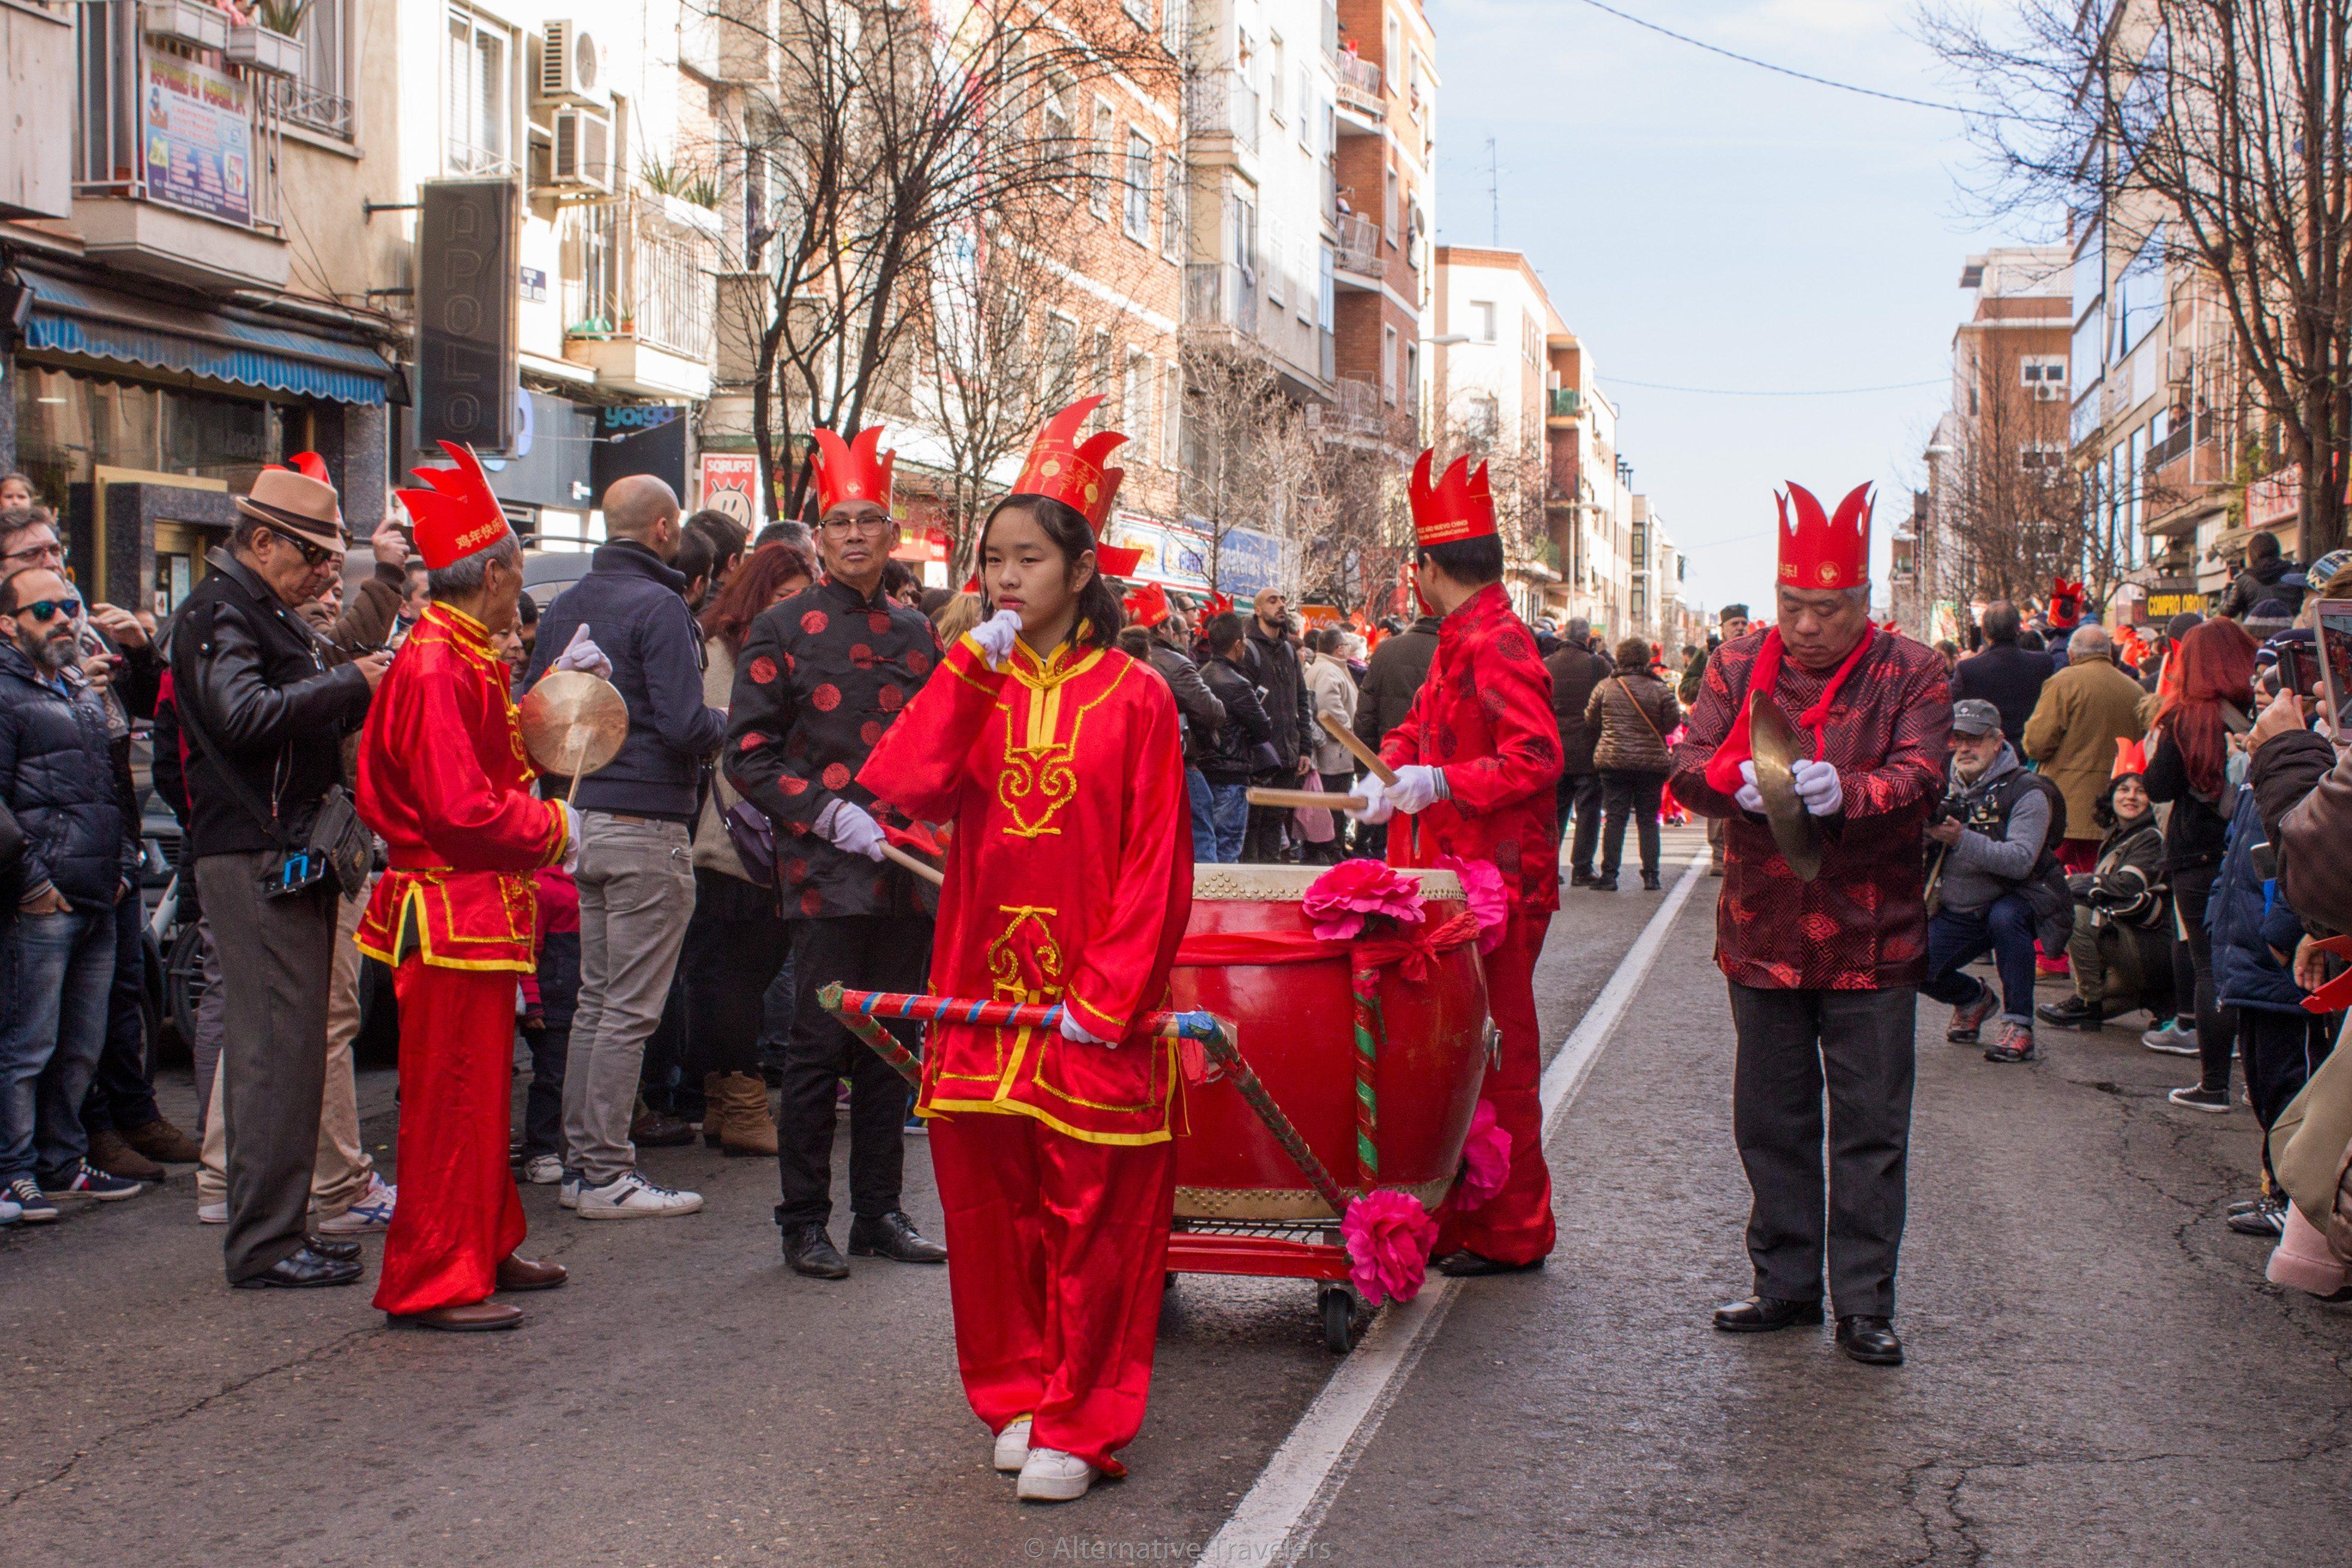 celebrating chinese new year in madrid's chinatown